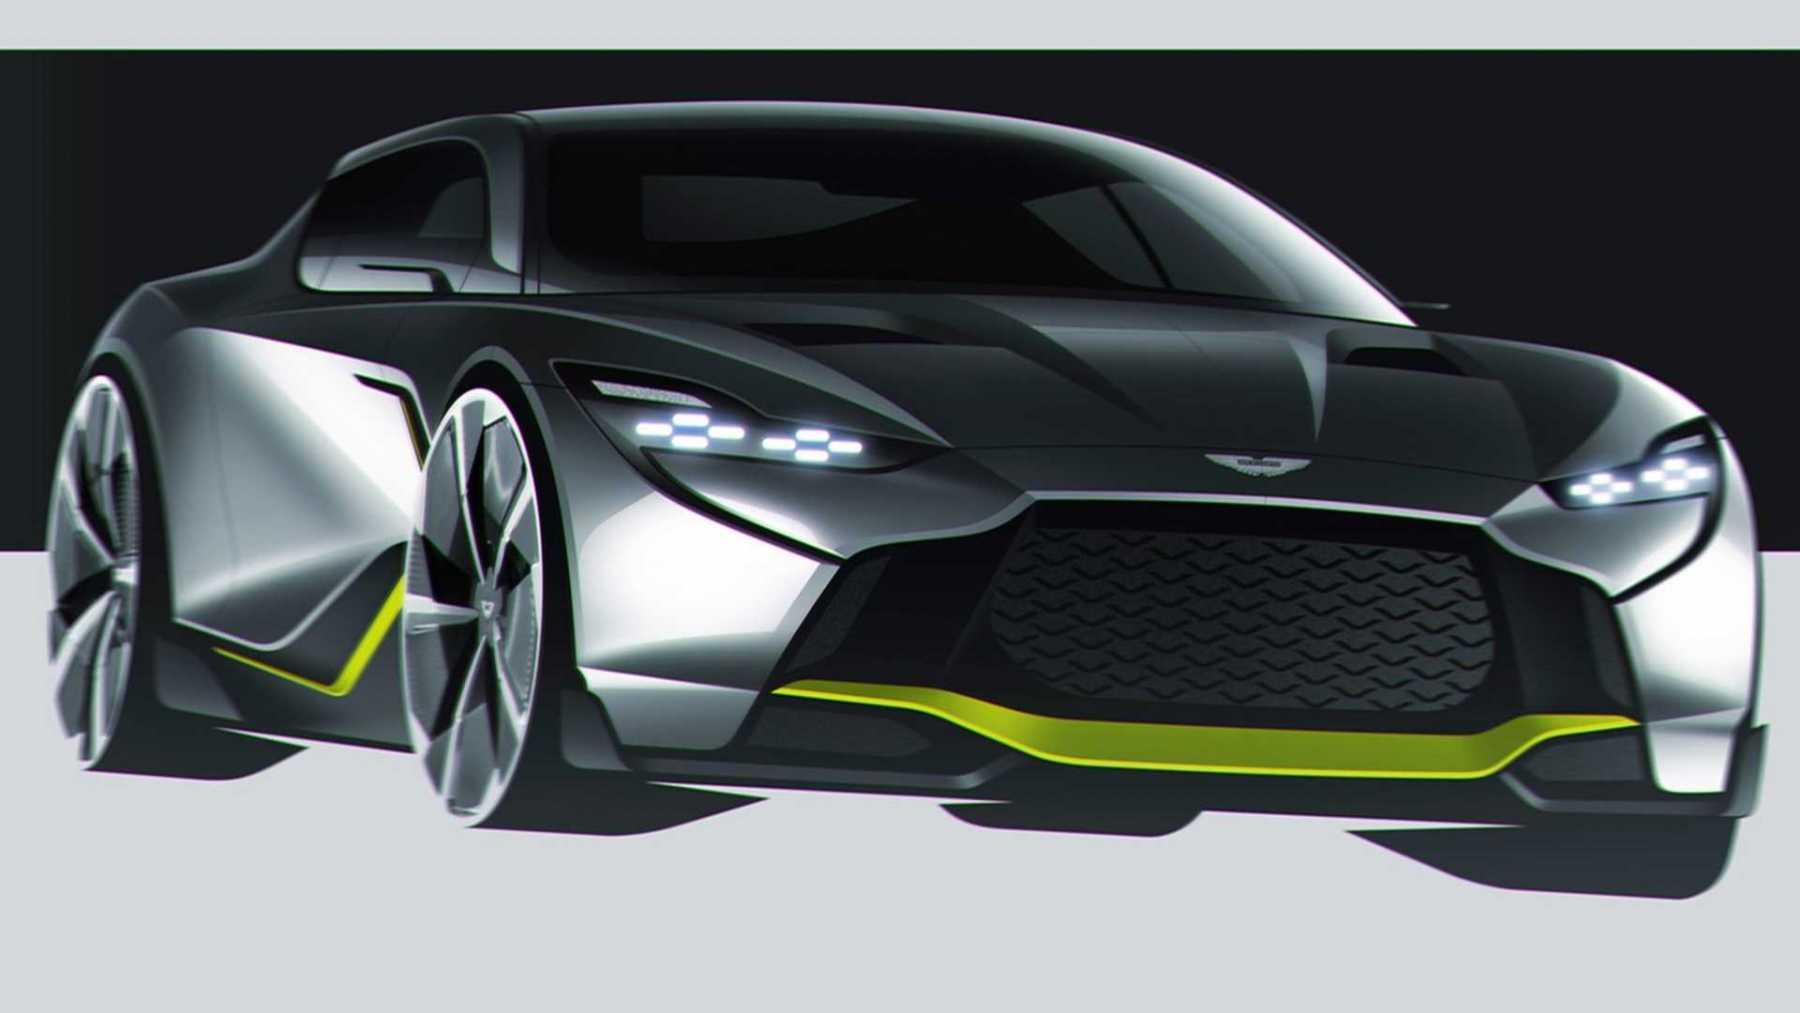 Aston Martin DB12 AMR - Rendering